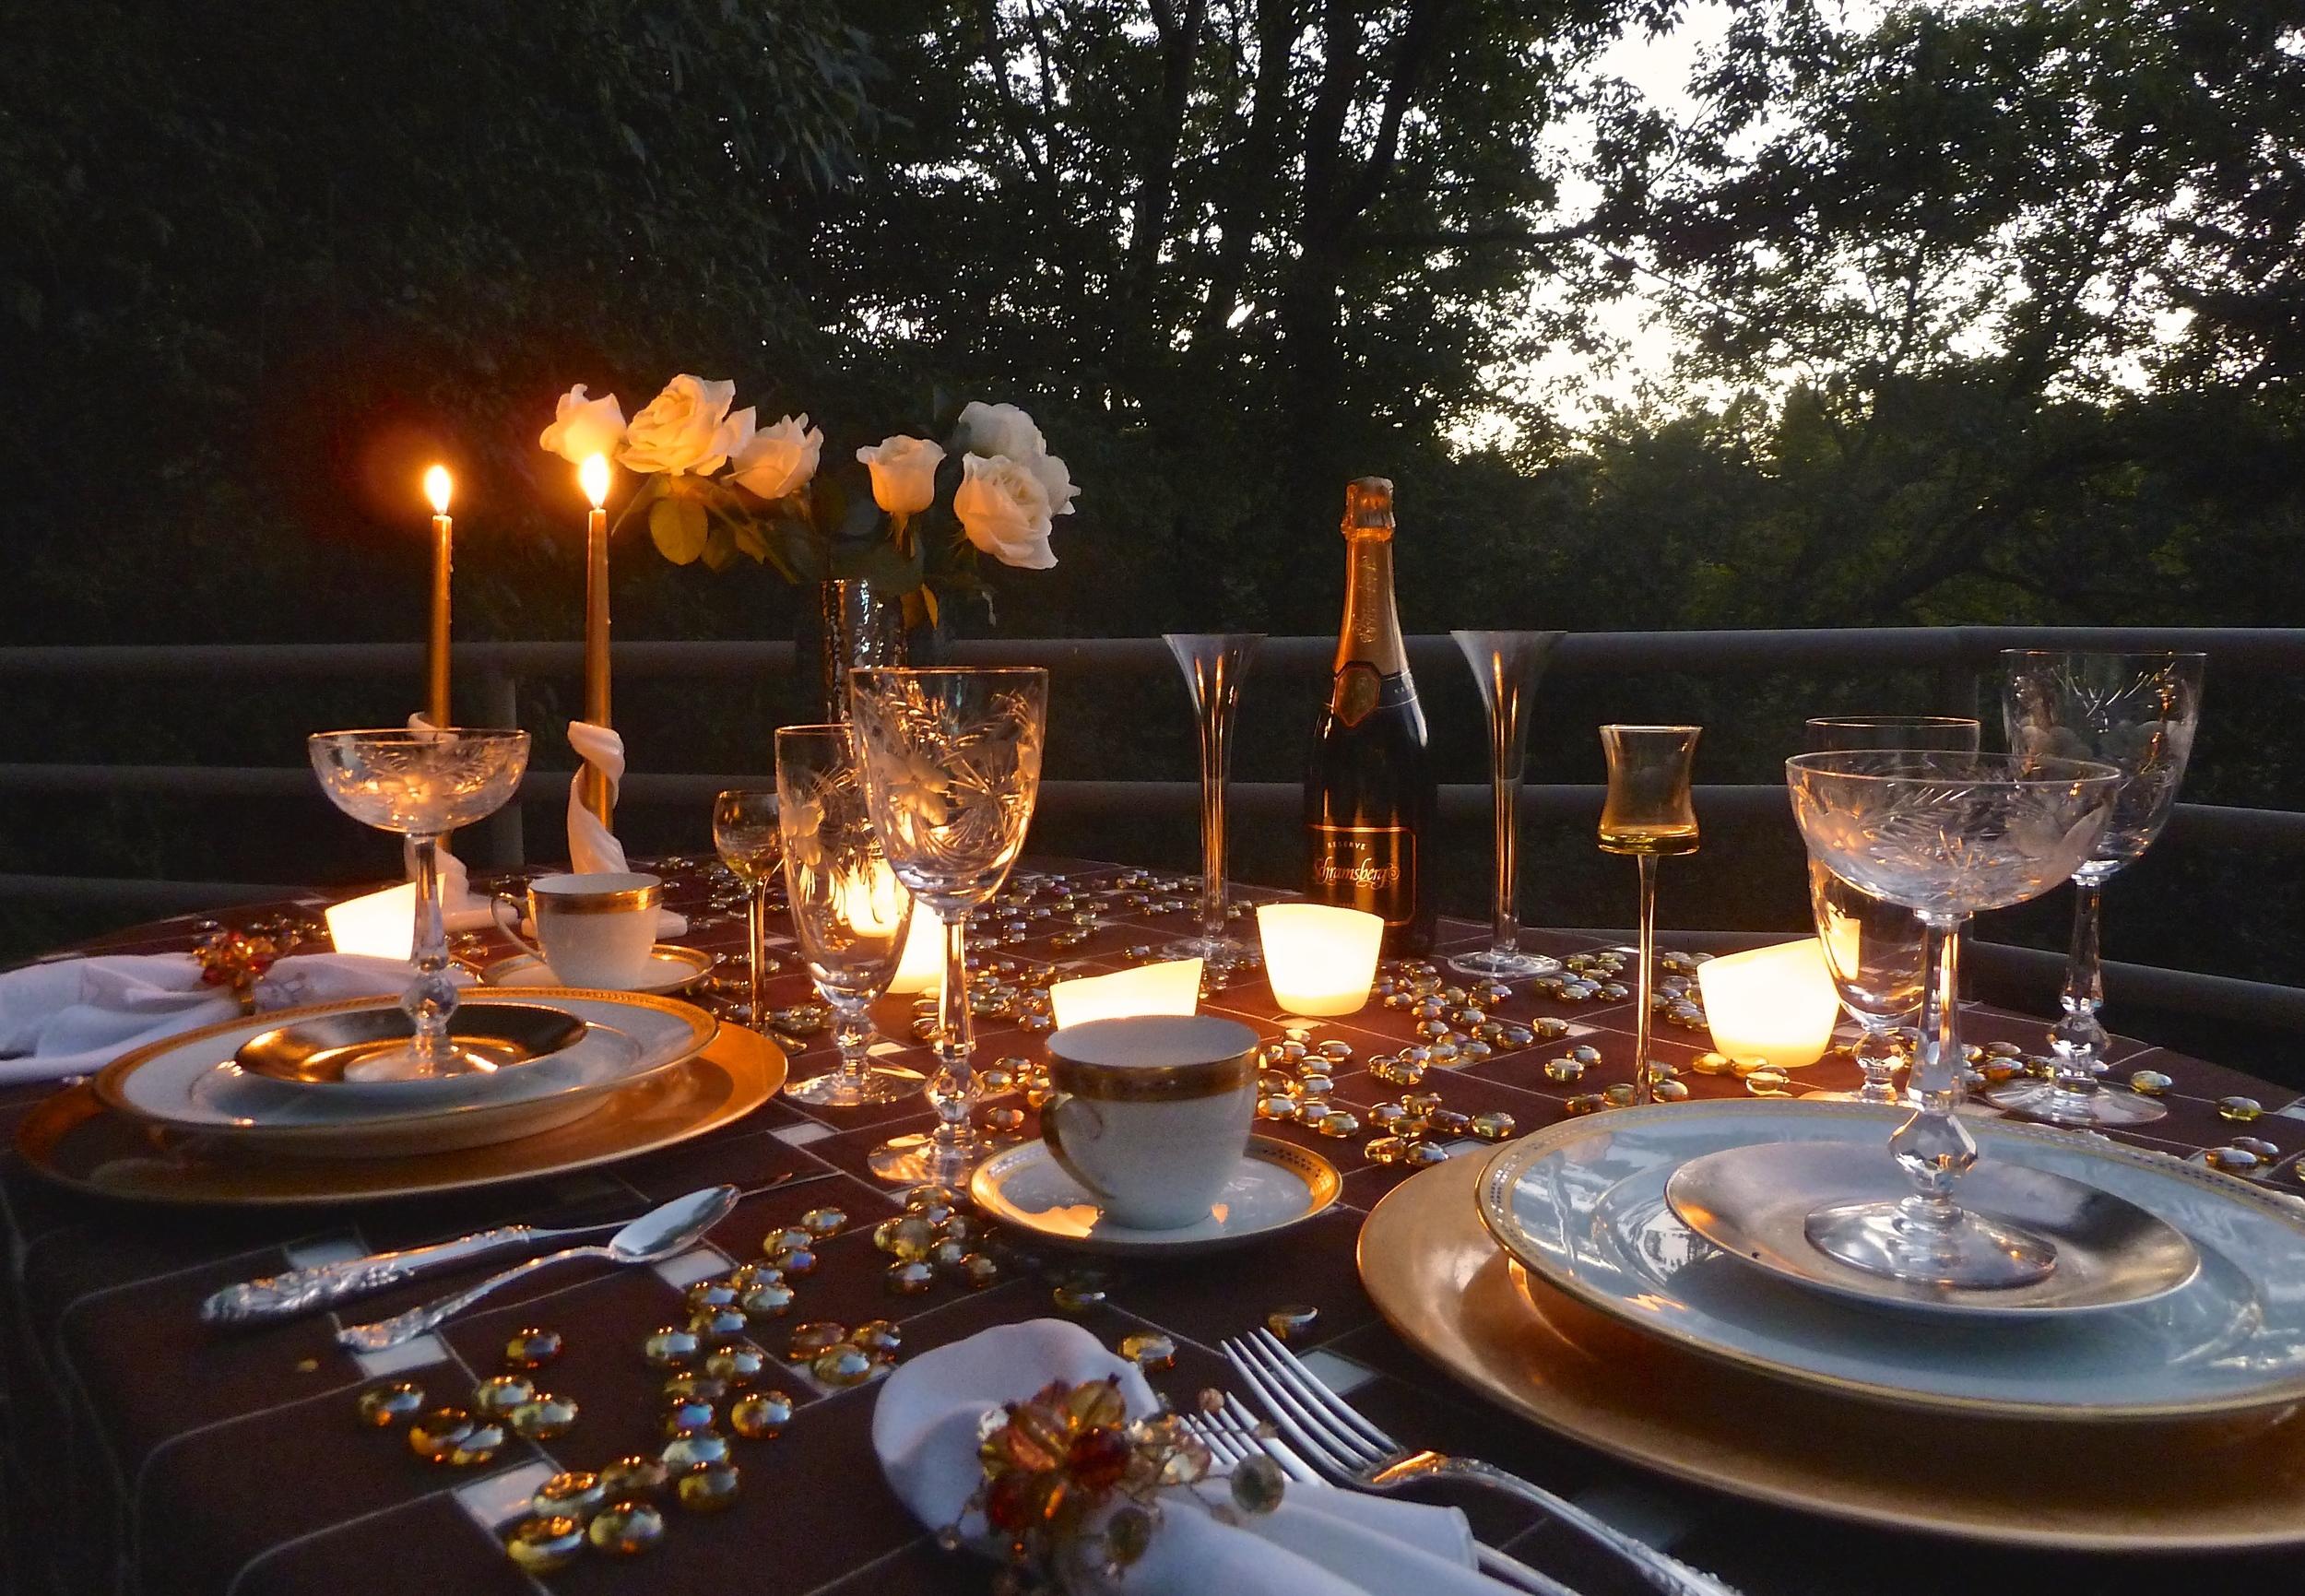 Romantic Sunset Table